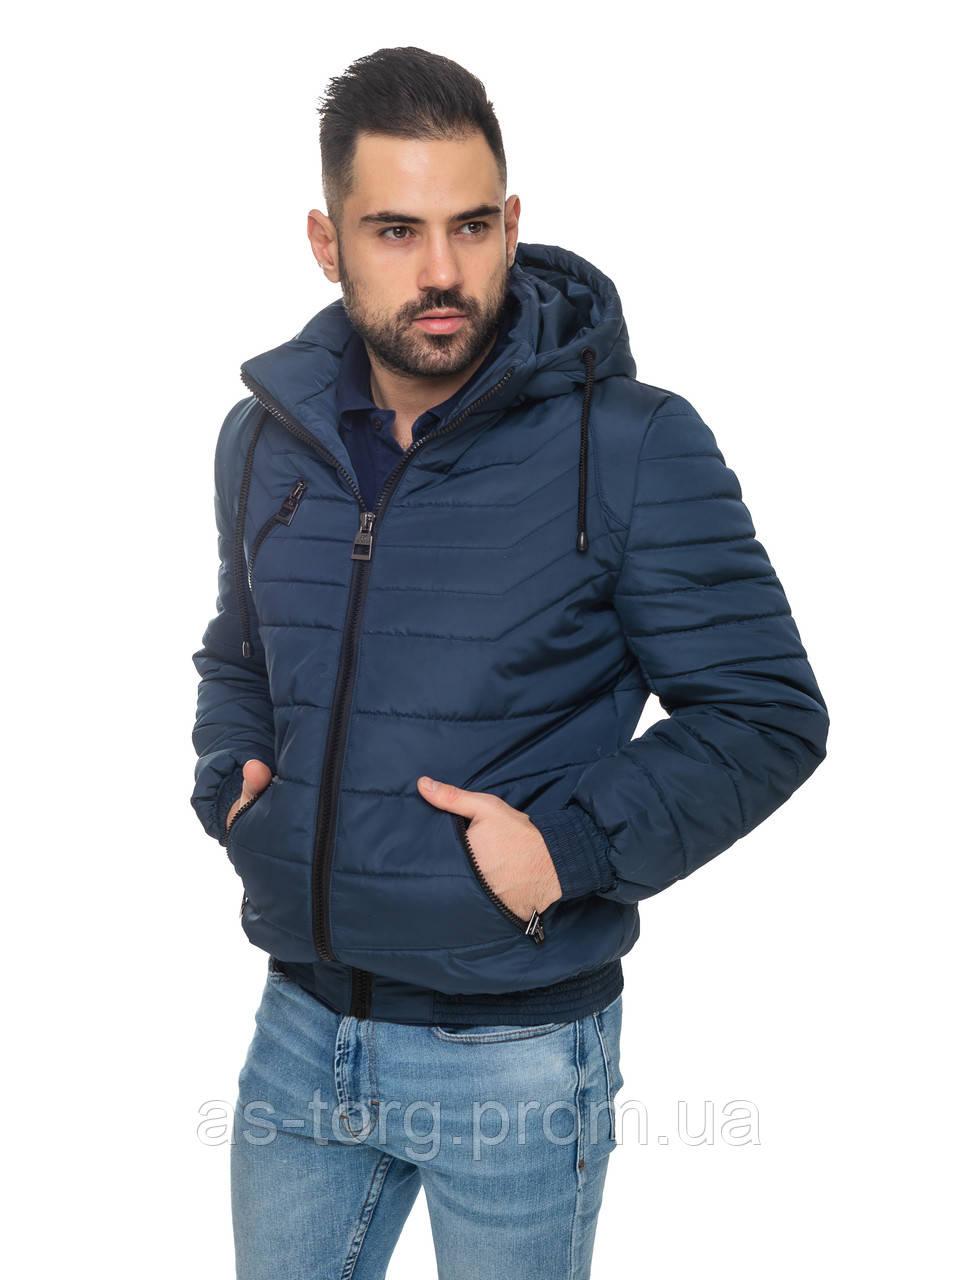 Короткая куртка Архип Синий Размер 50